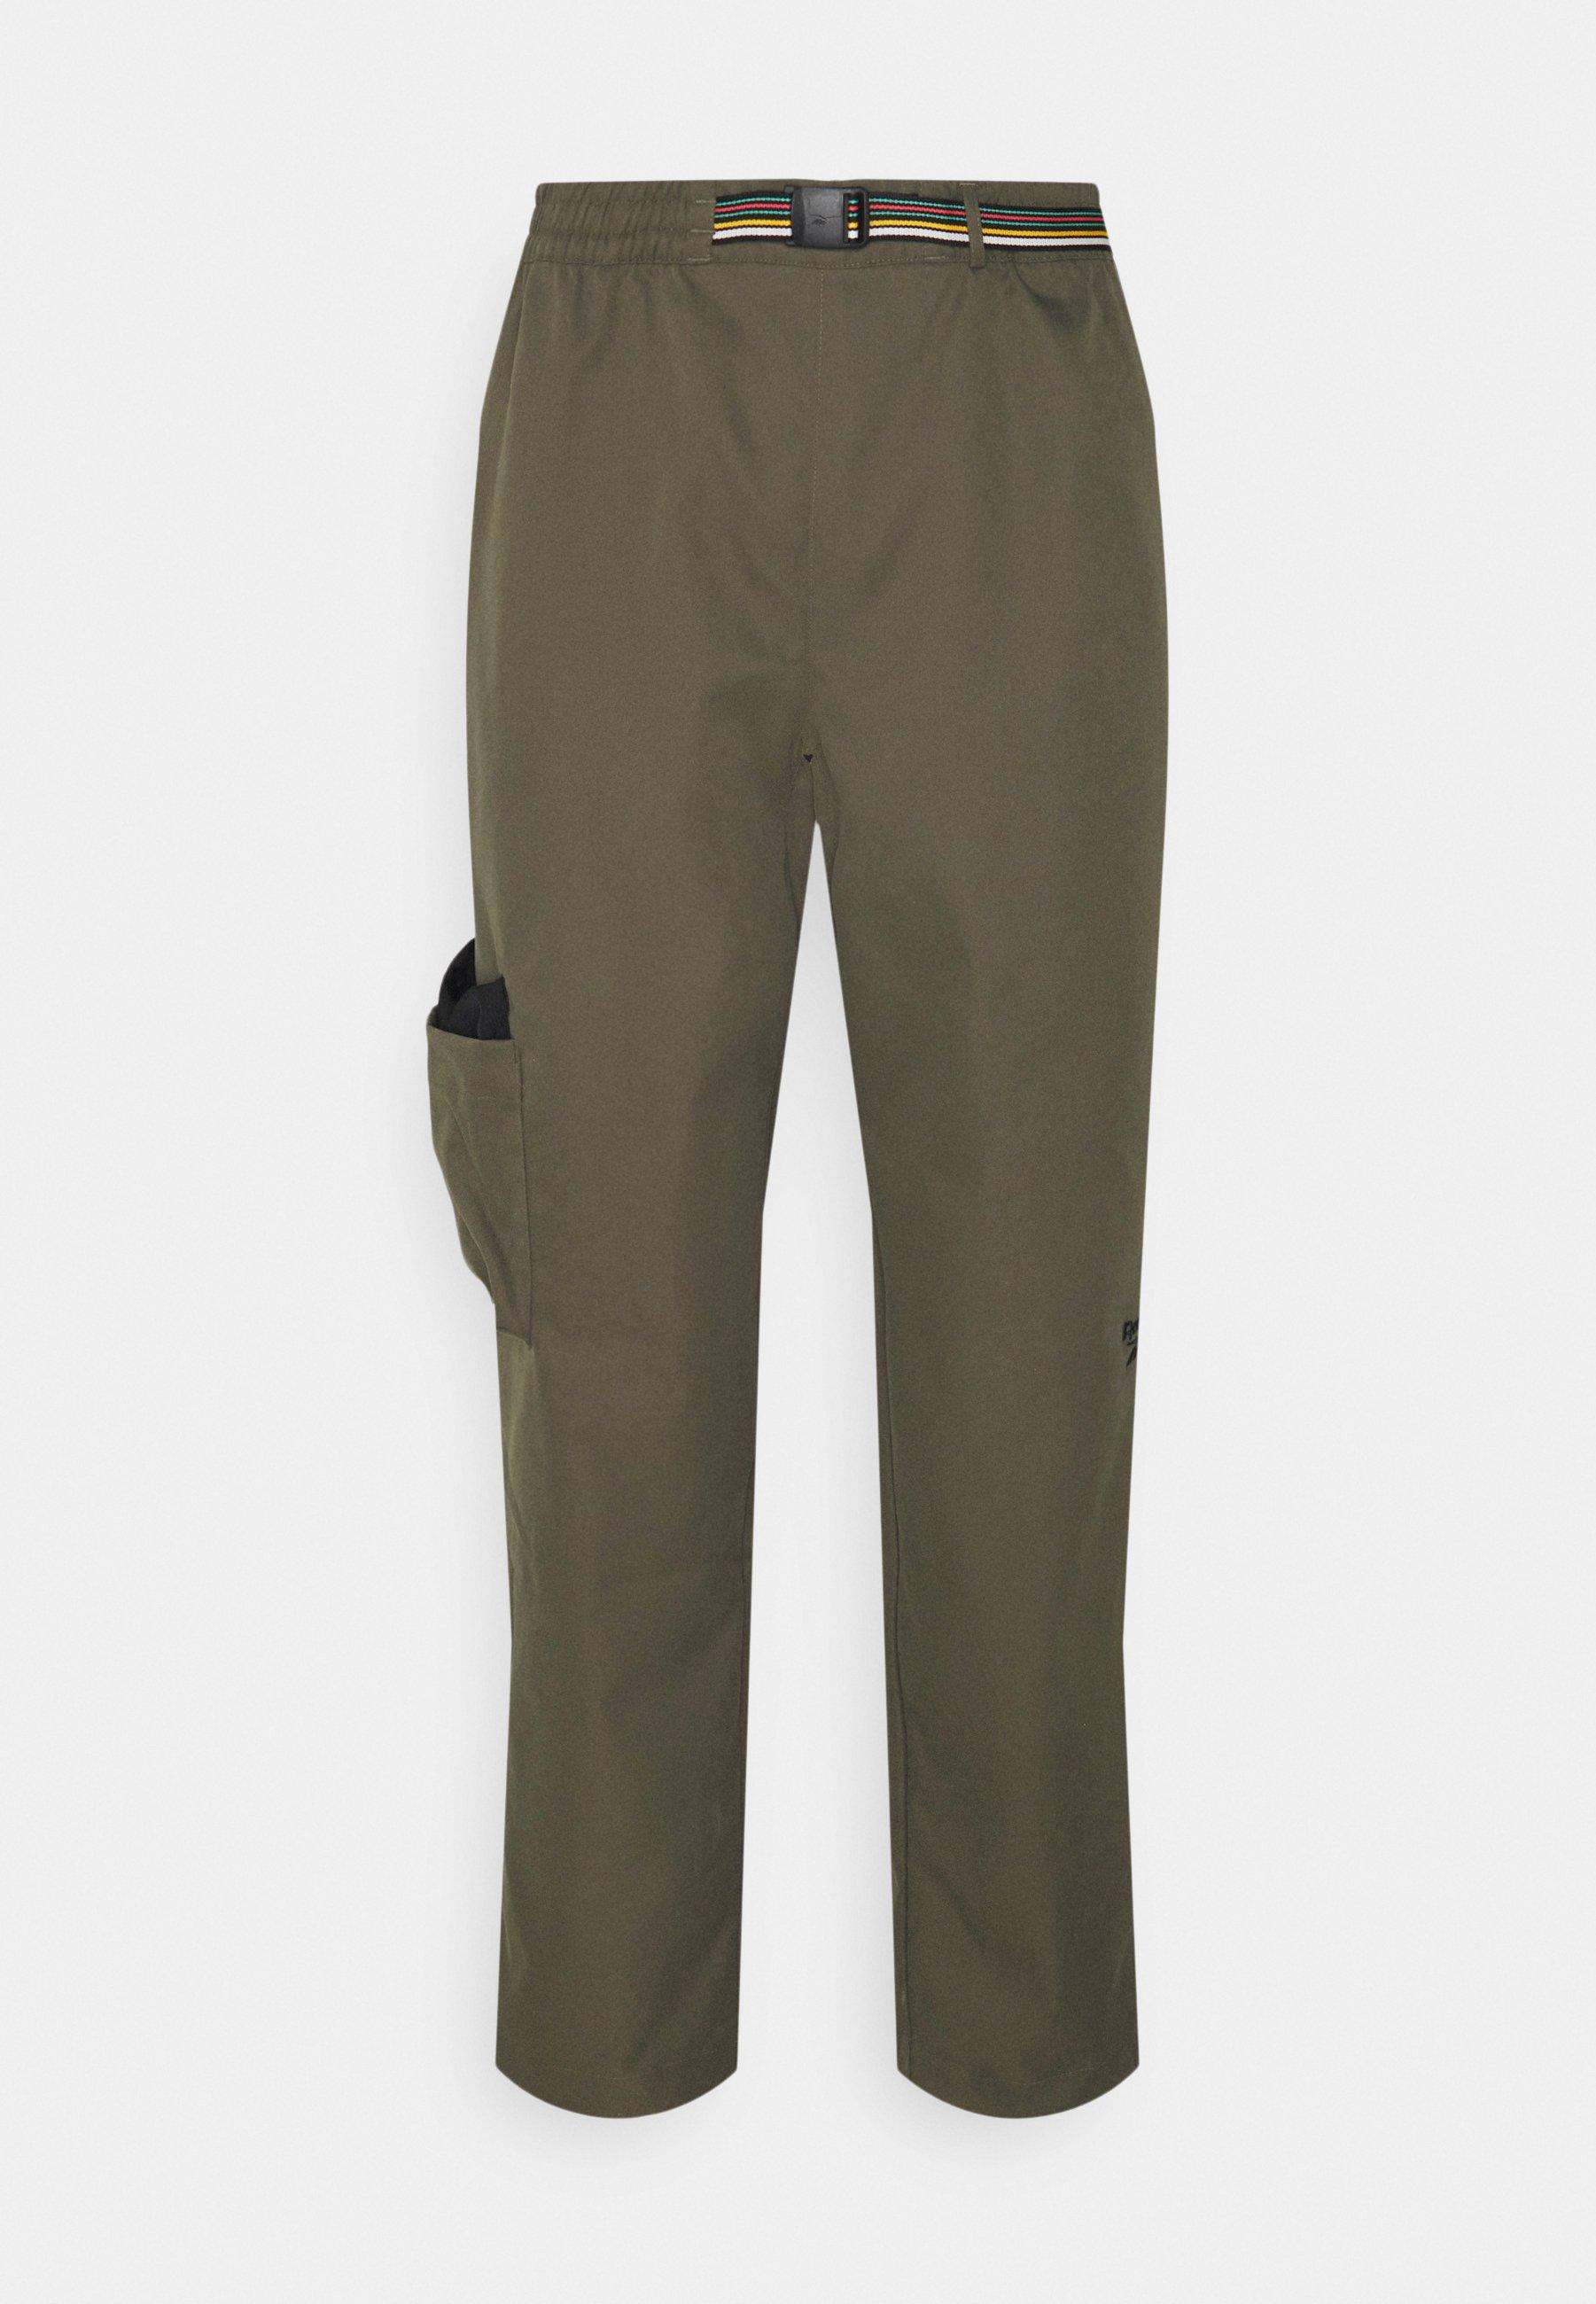 Homme CAMPING PANT - Pantalon cargo